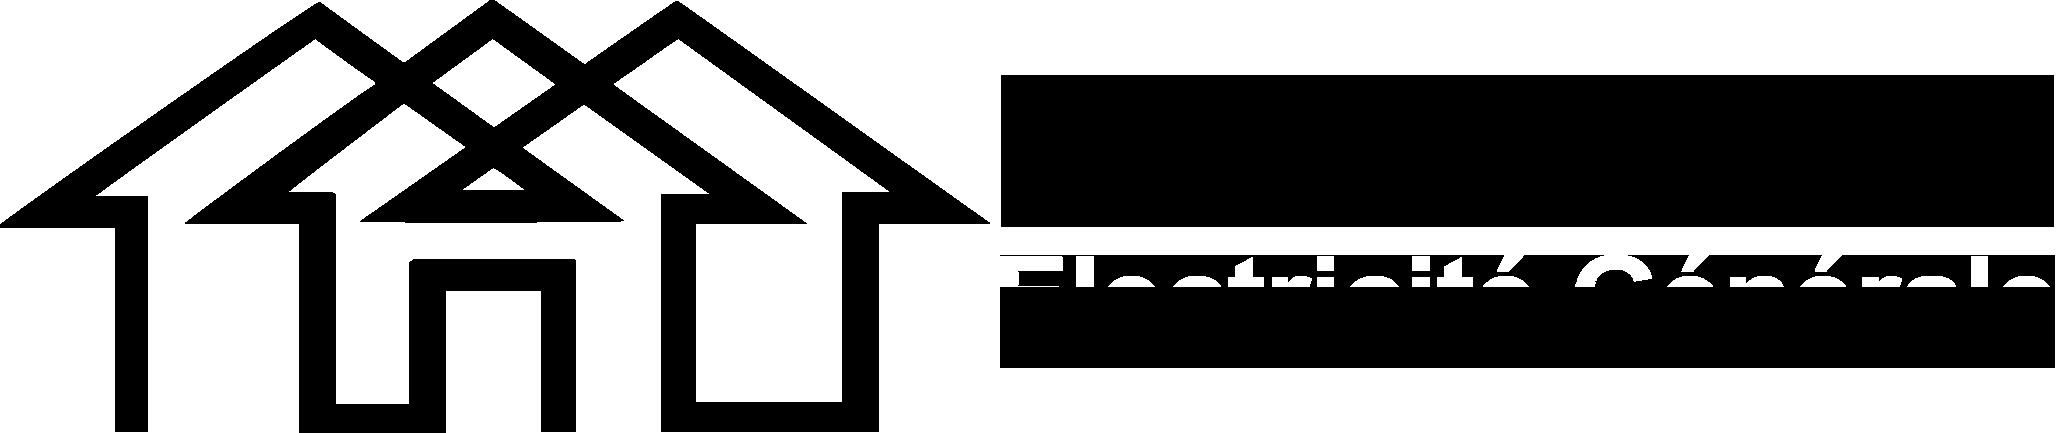 logo-flat